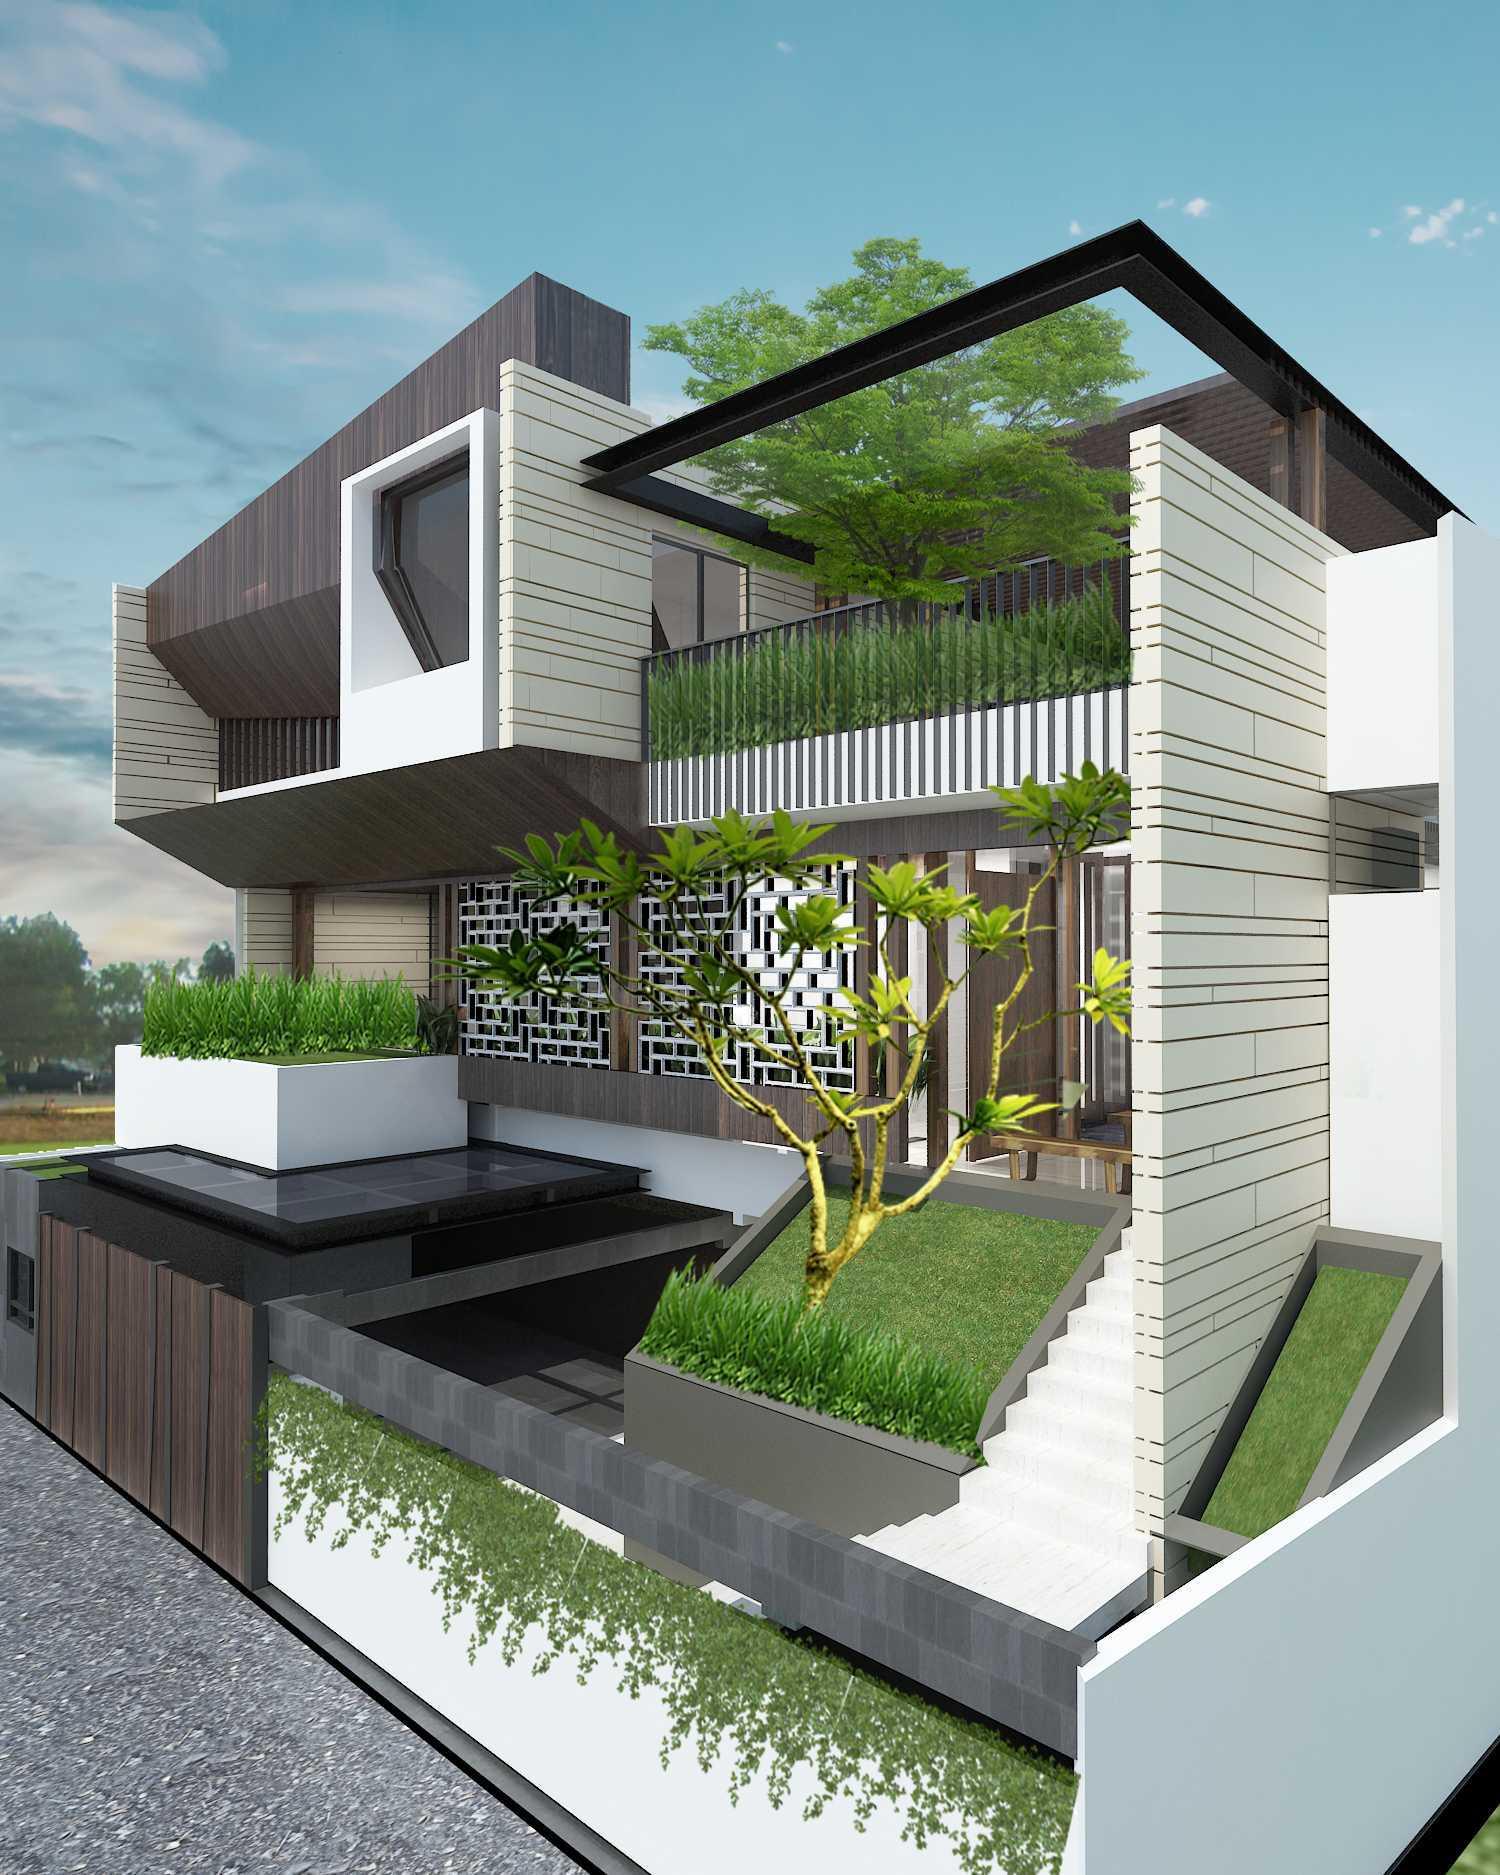 Pt Alradista Desain Indonesia Sa House Bandung City, West Java, Indonesia Bandung City, West Java, Indonesia Alradistadesign-Sa-House   50512